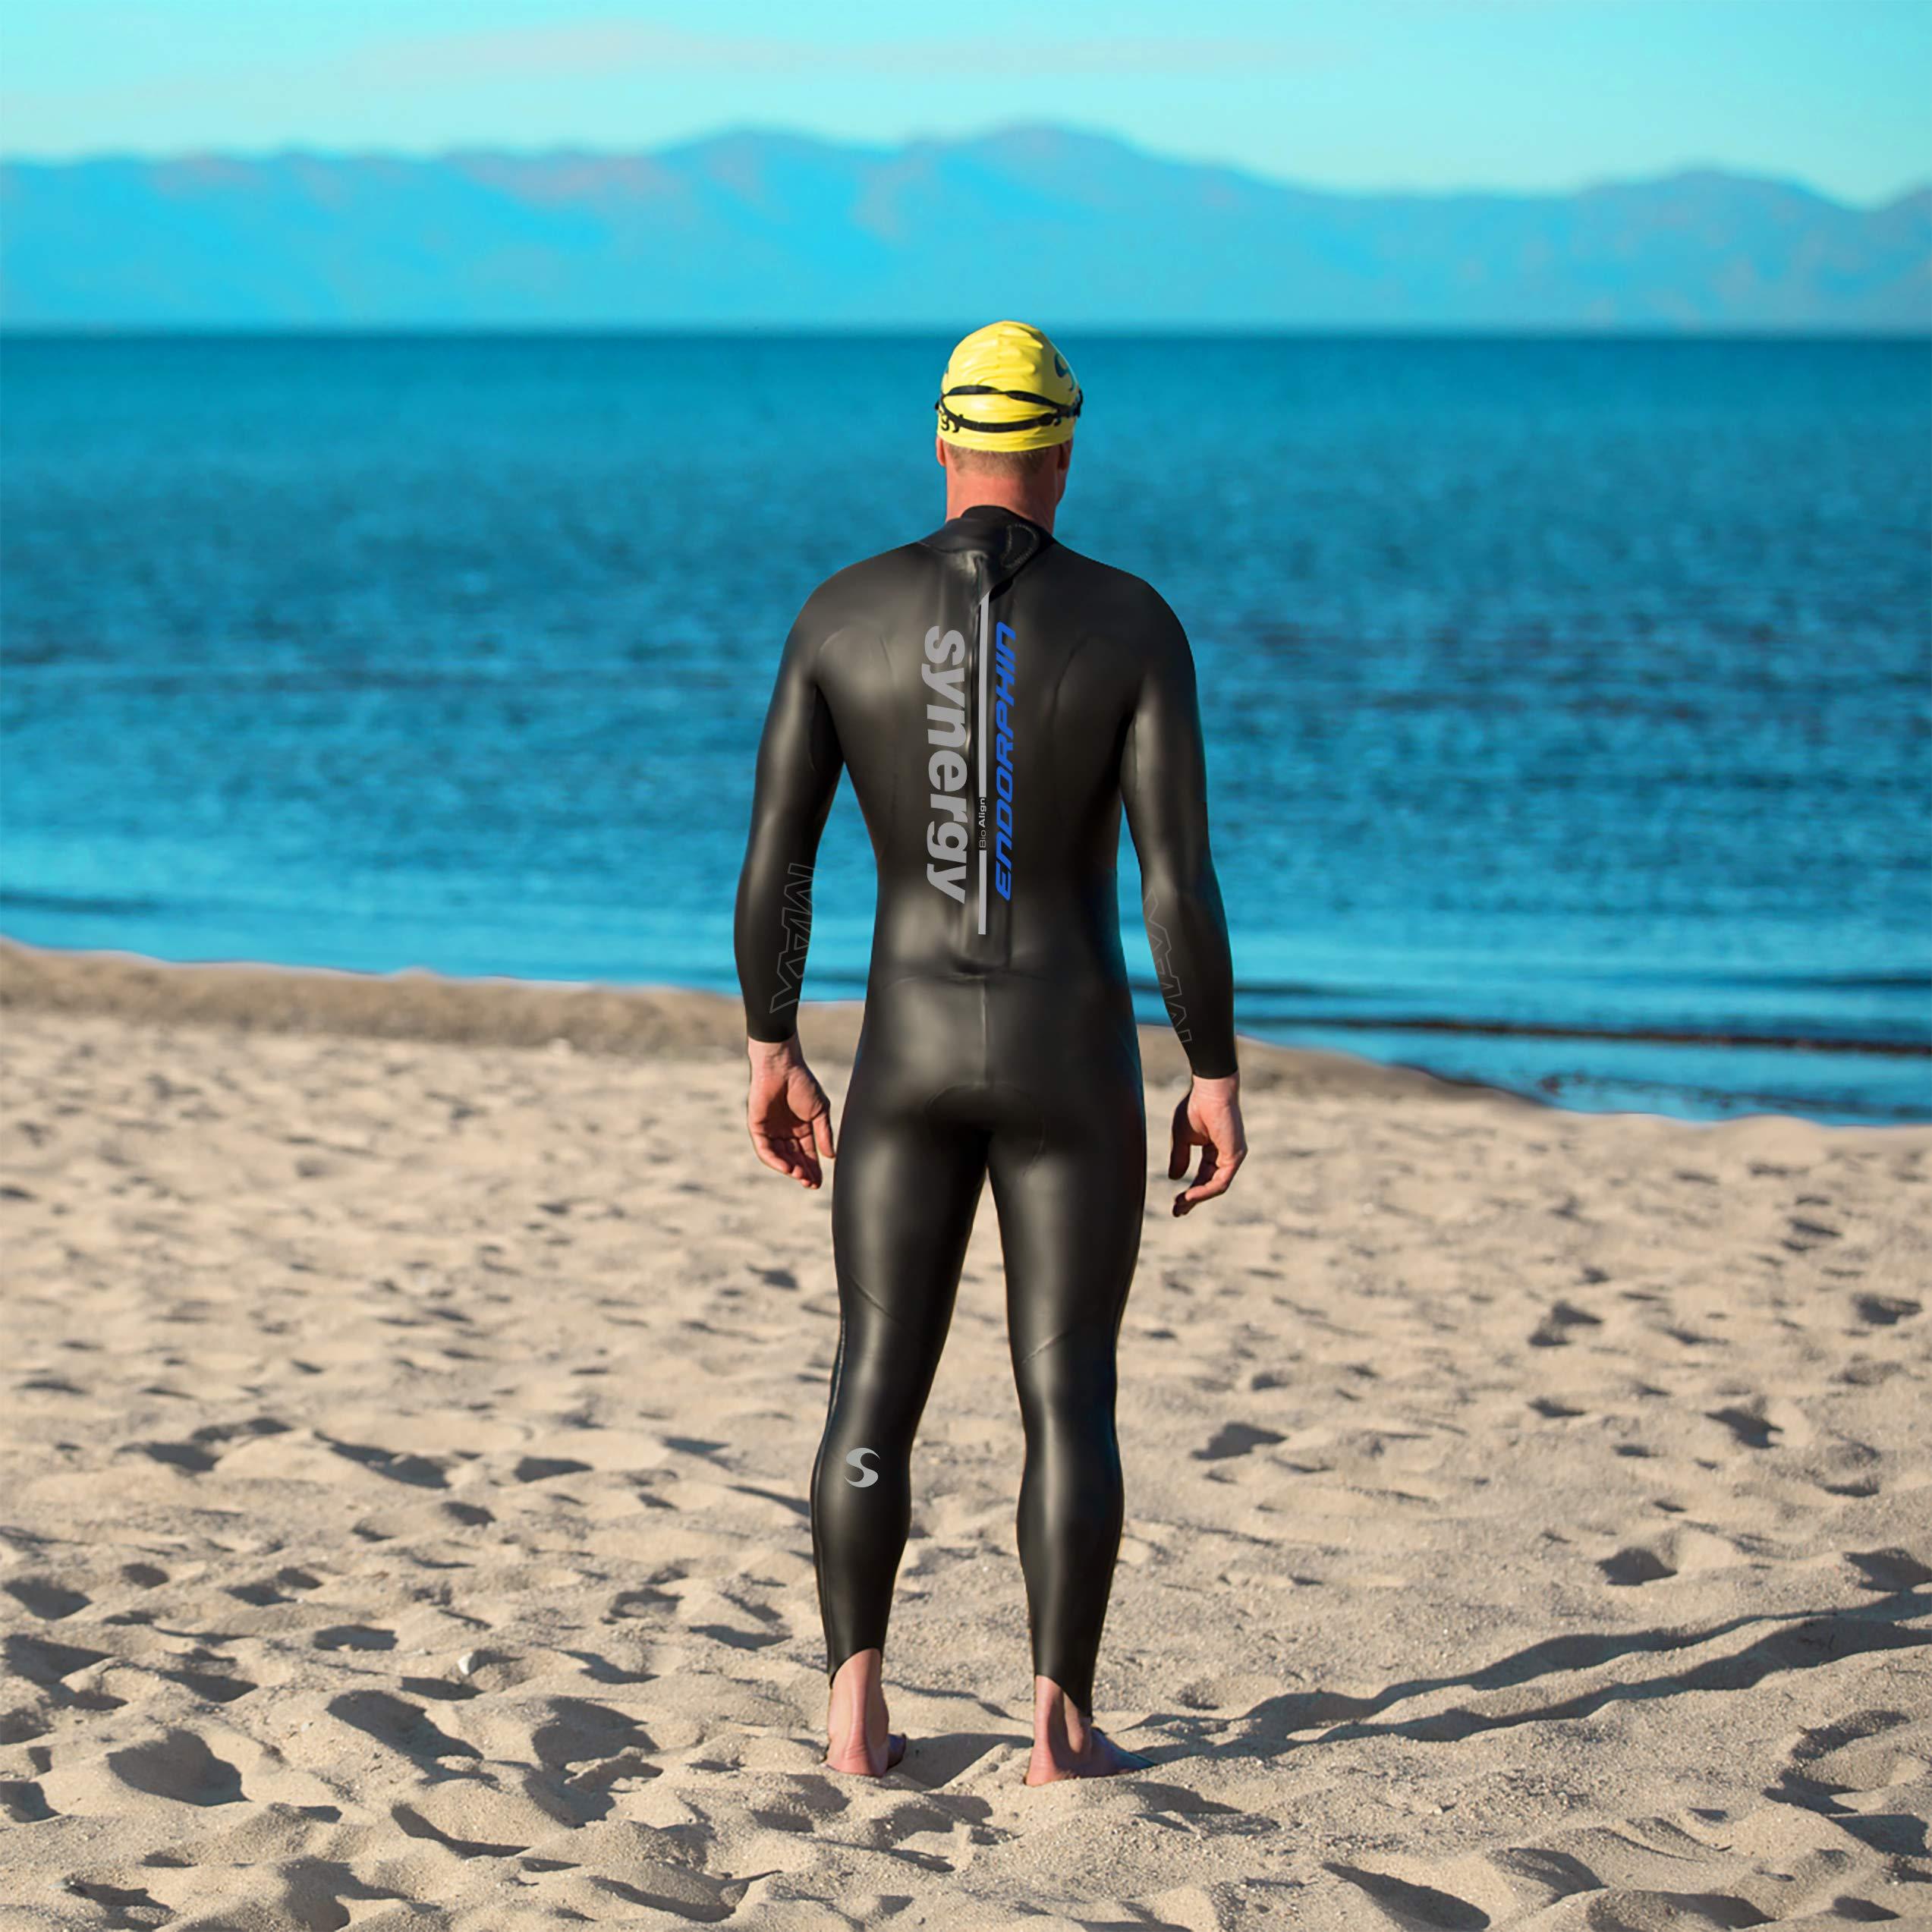 Synergy Endorphin Men's Full Sleeve Triathlon Wetsuit (M3) by Synergy (Image #6)